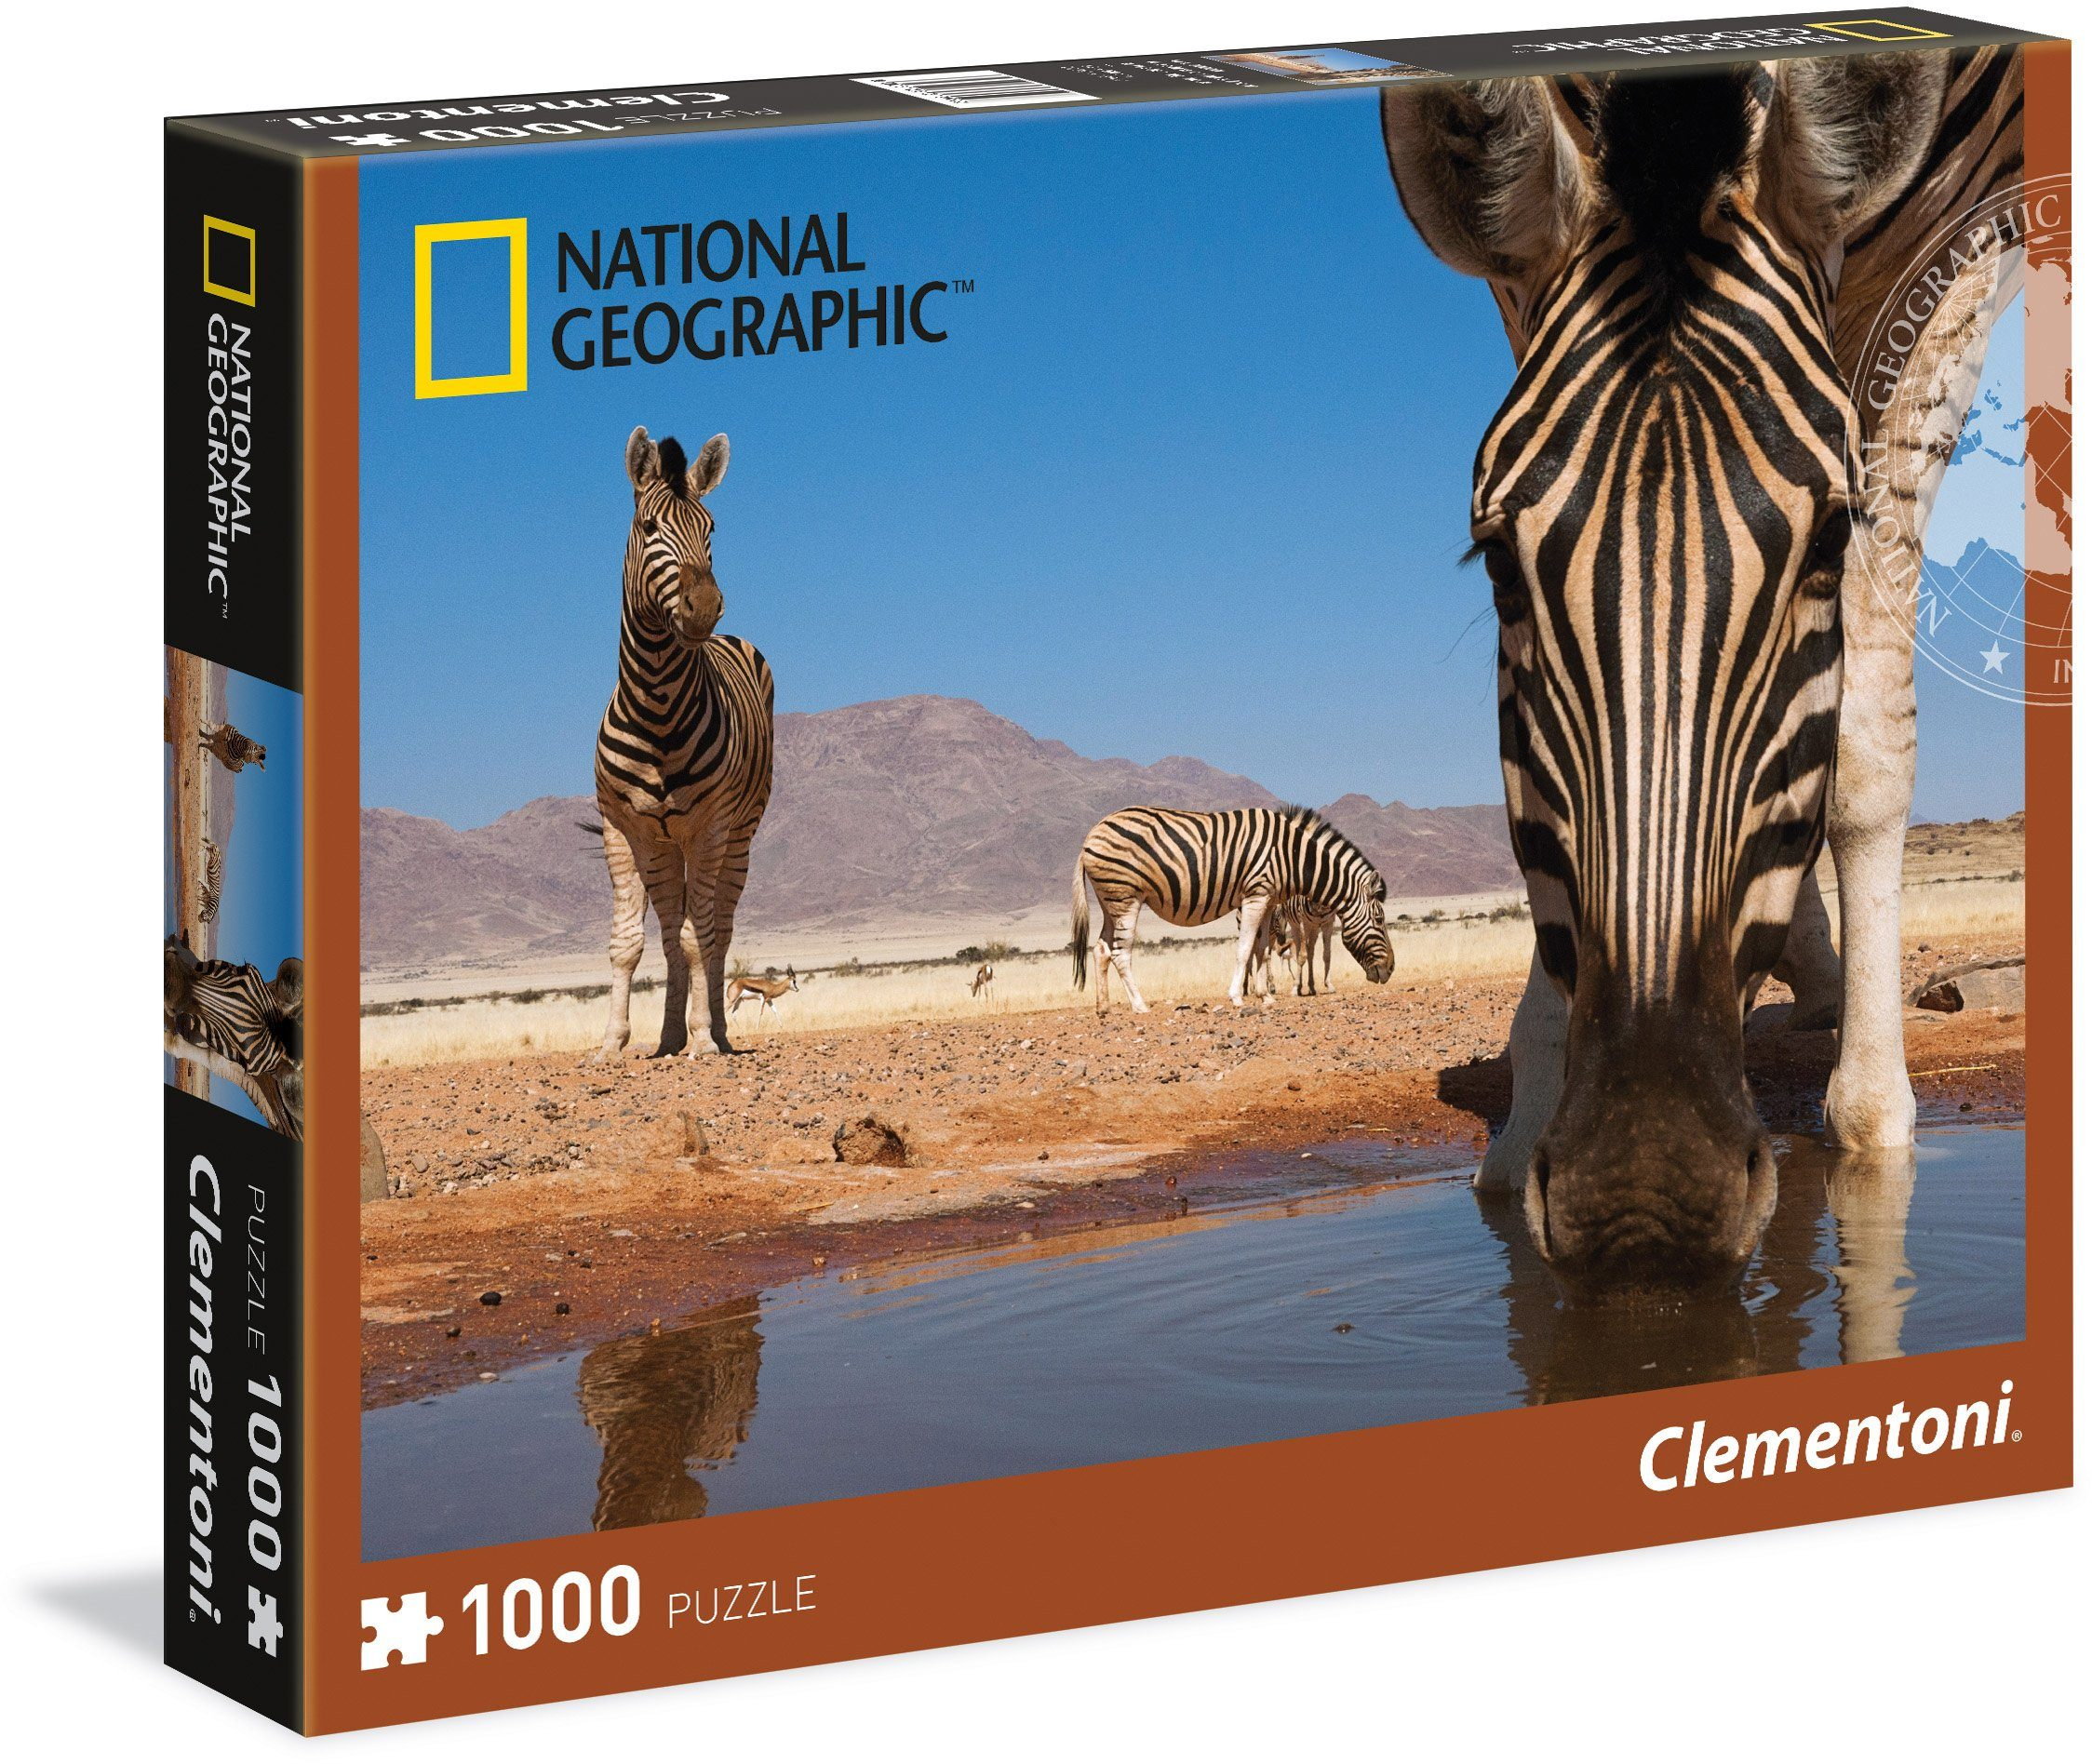 Clementoni Puzzle, 1000 Teile, »National Geographic Zebra«